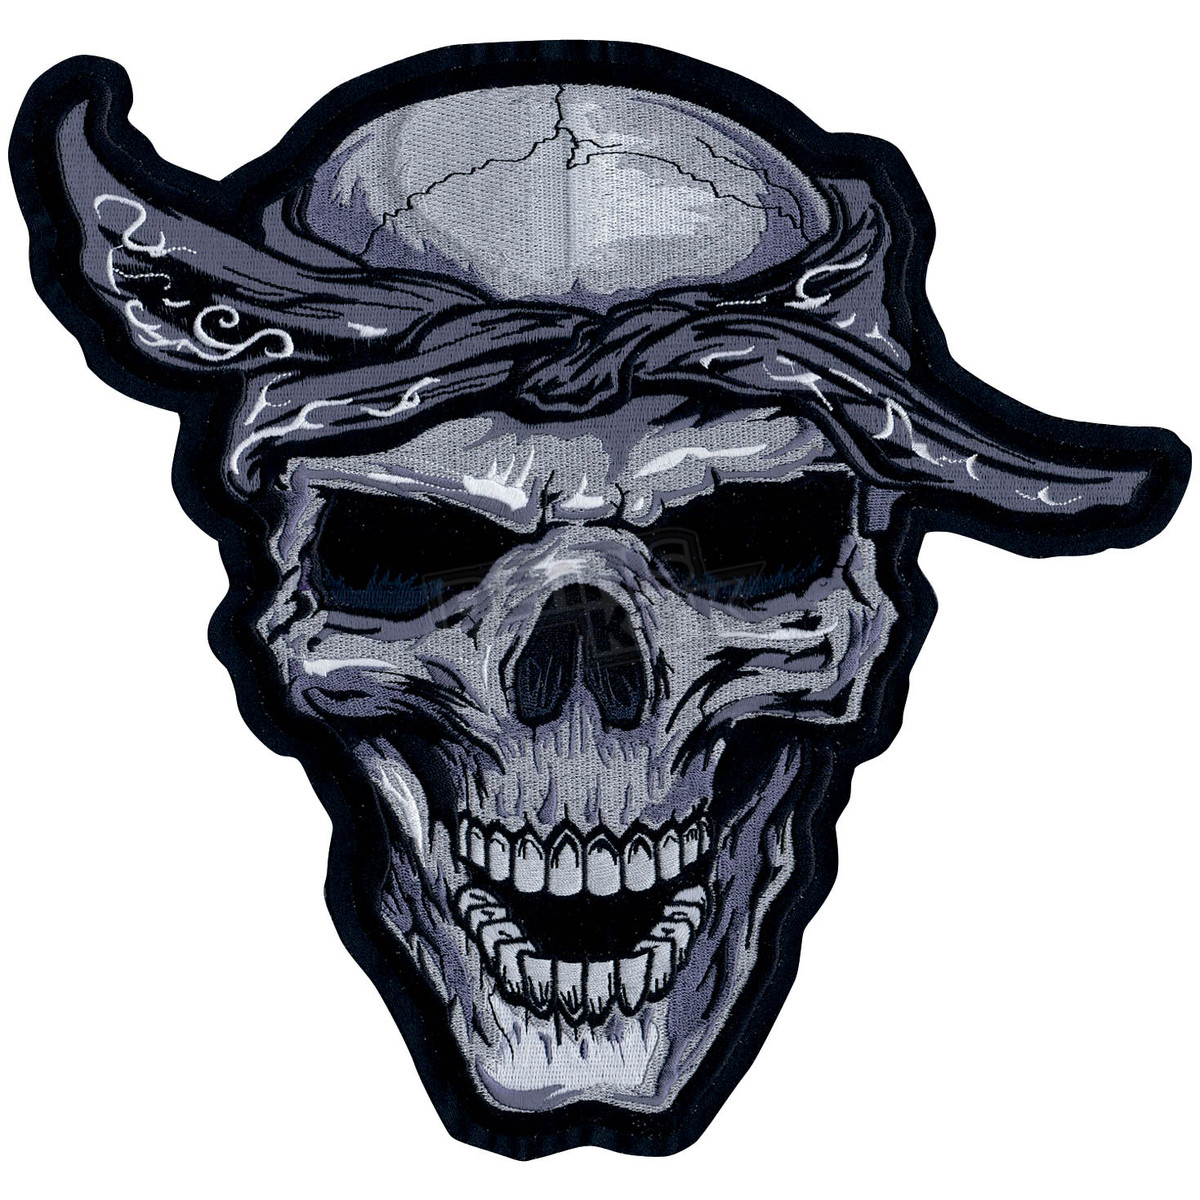 1200x1200 Skull In Bandana Chainimage